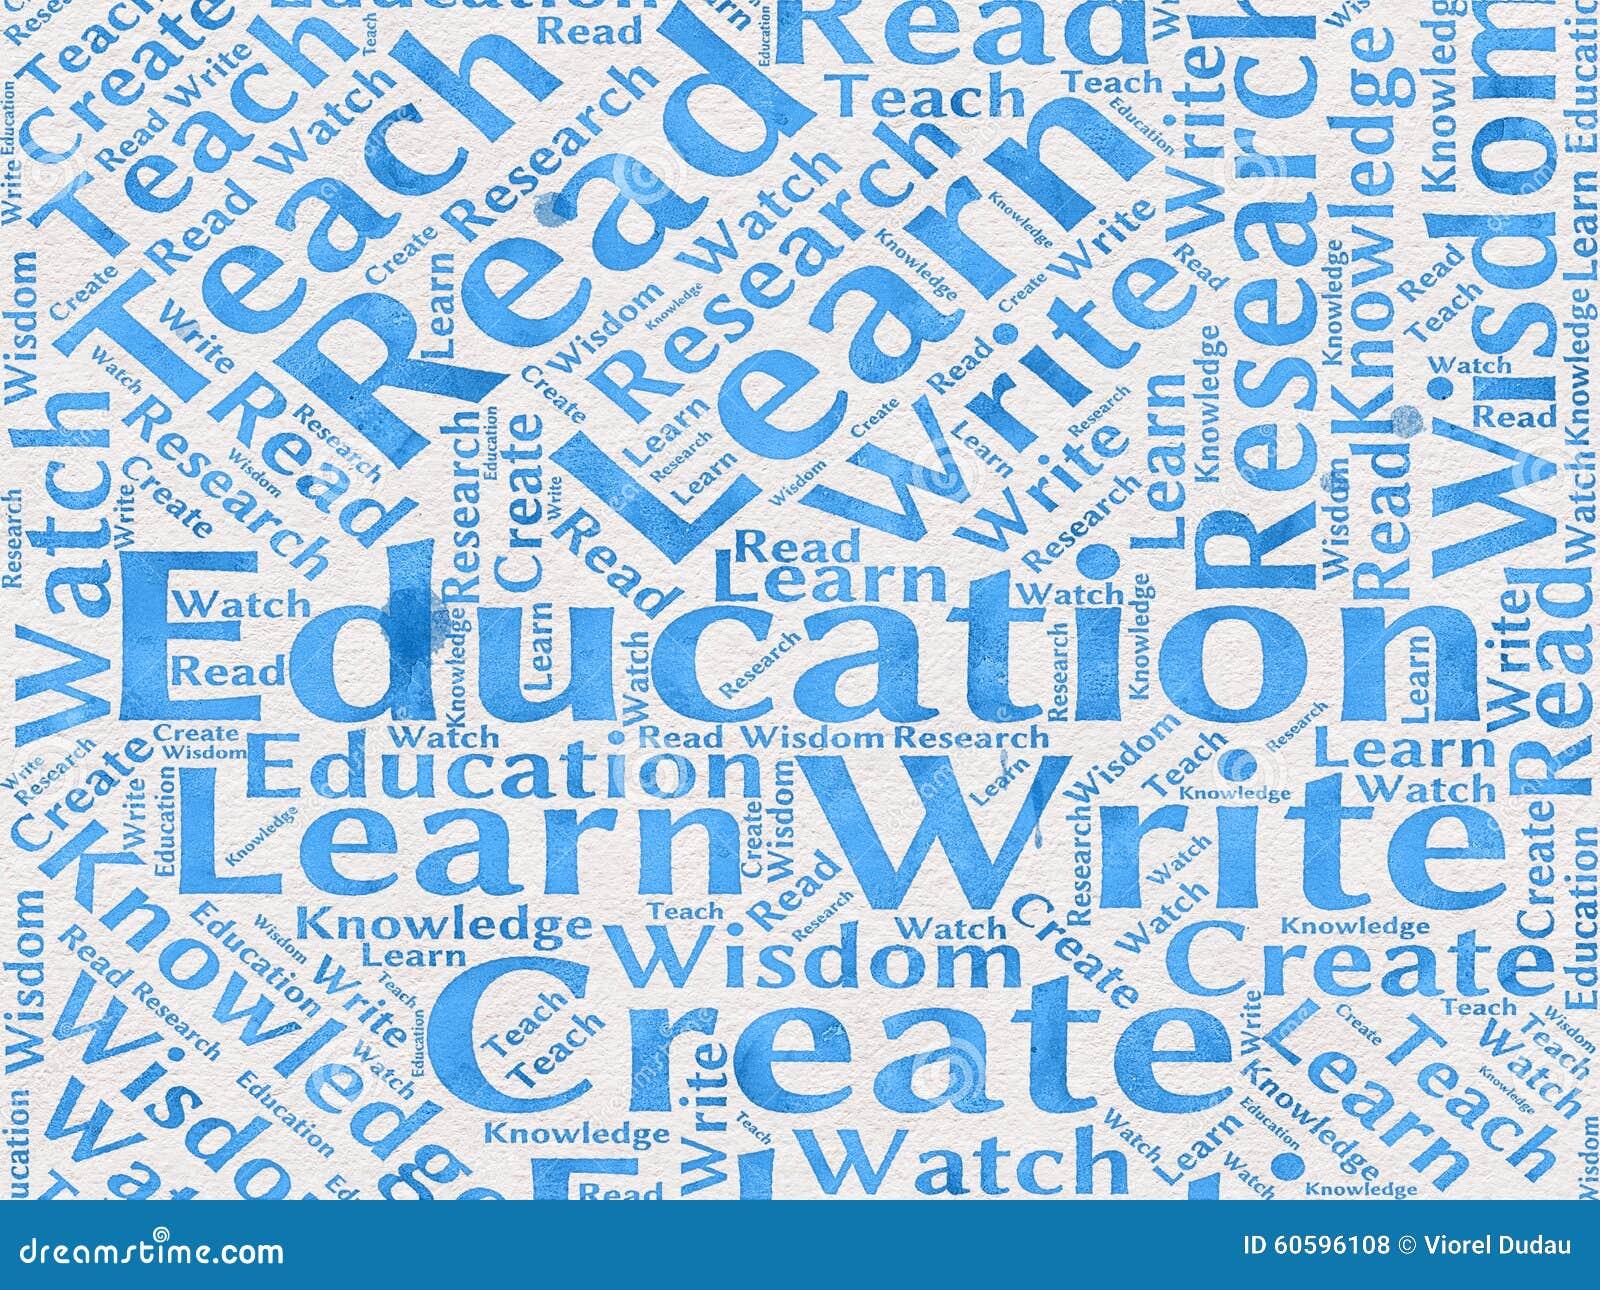 education words background stock illustration illustration of paper